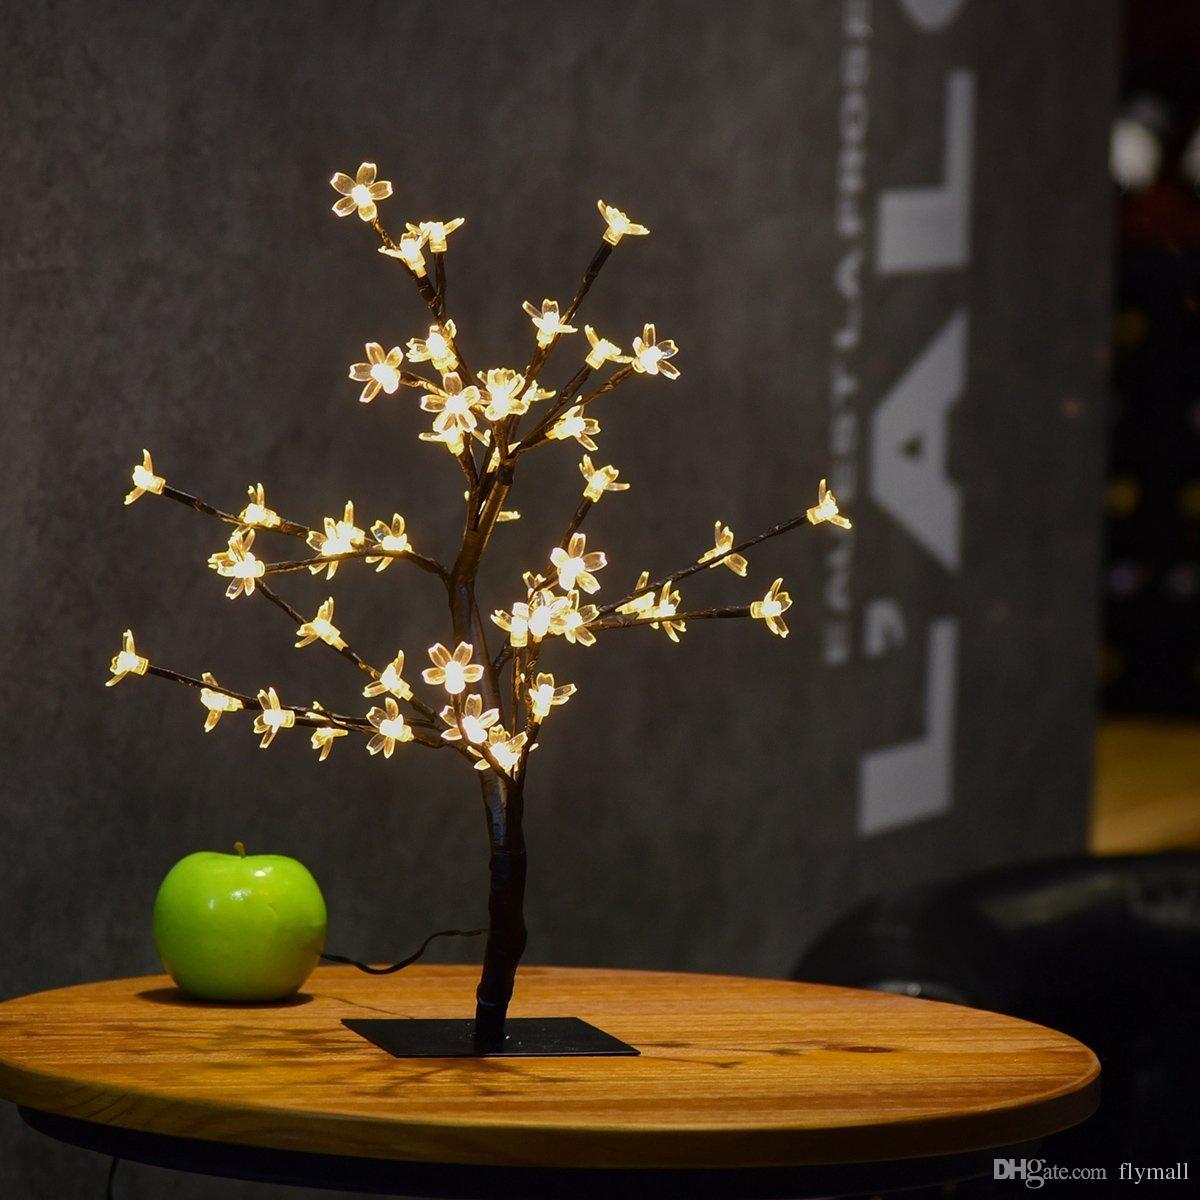 Table Lights Wedding 2019 Crystal Cherry Blossom 48 Leds Tree Light Night Lights Table